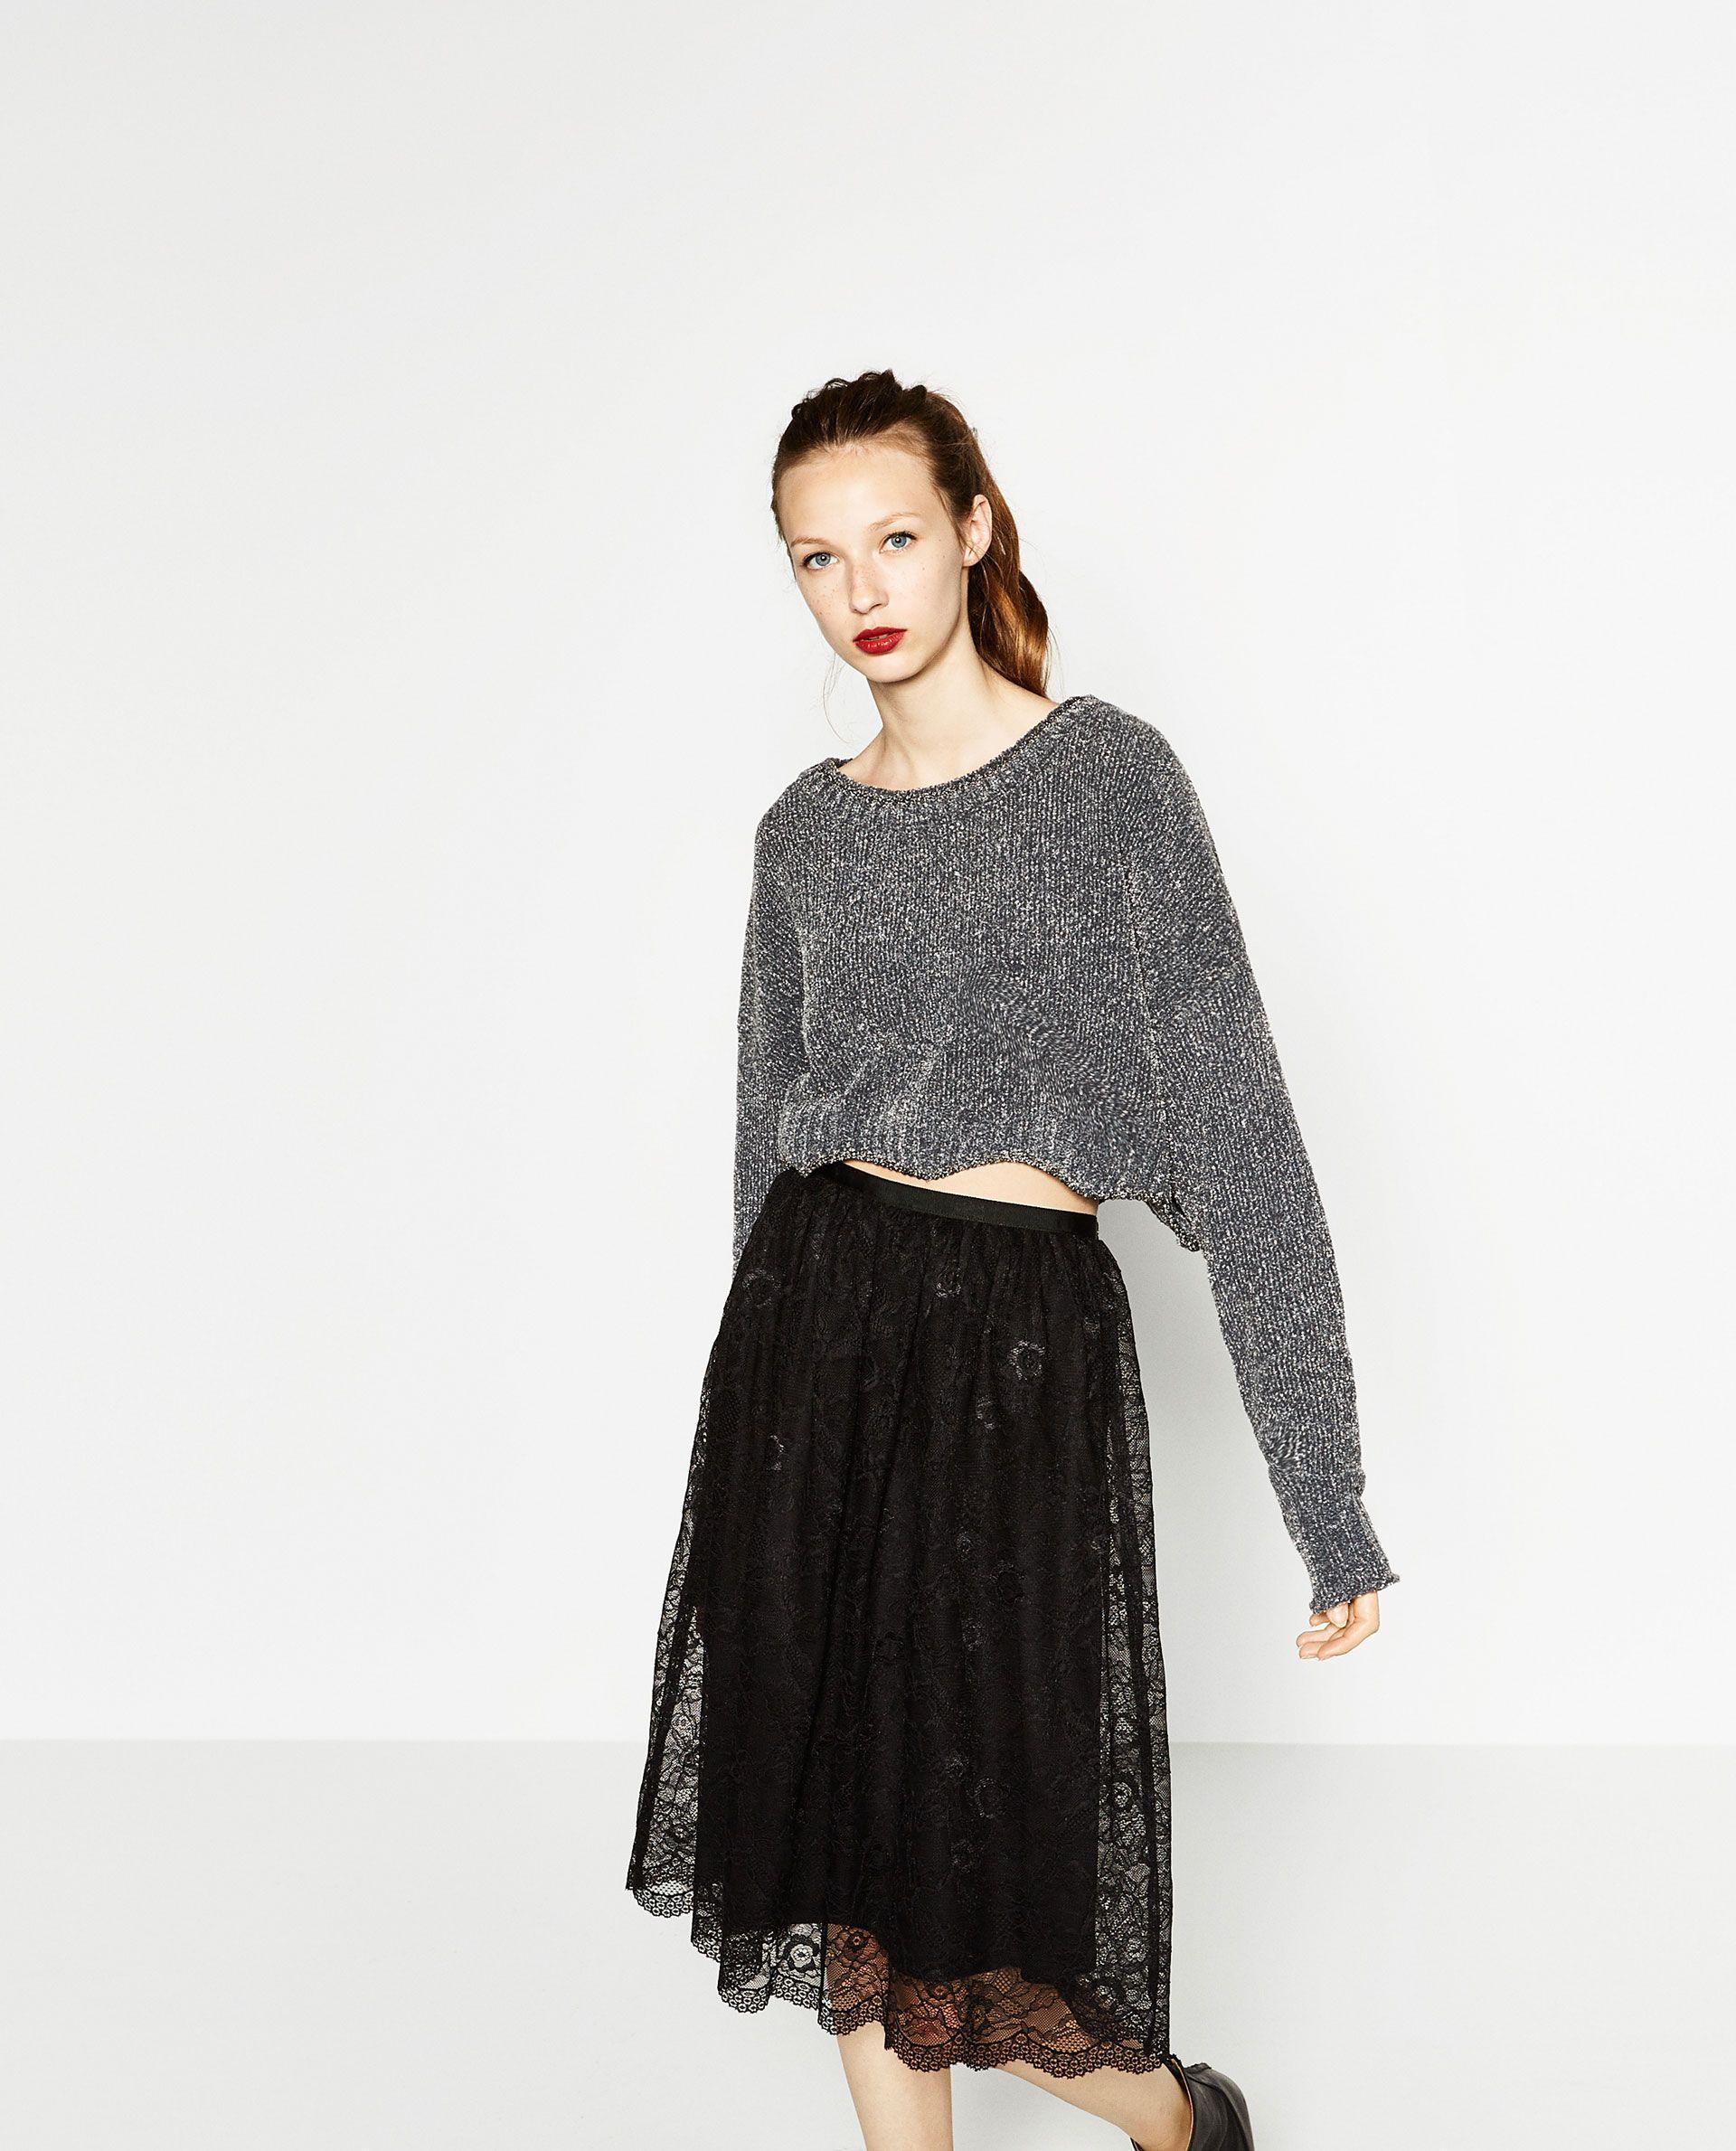 45cd0d02151 Encaje Que Adoro Pinterest Zara Midi Lo Falda Mujer De Zara wnftFU